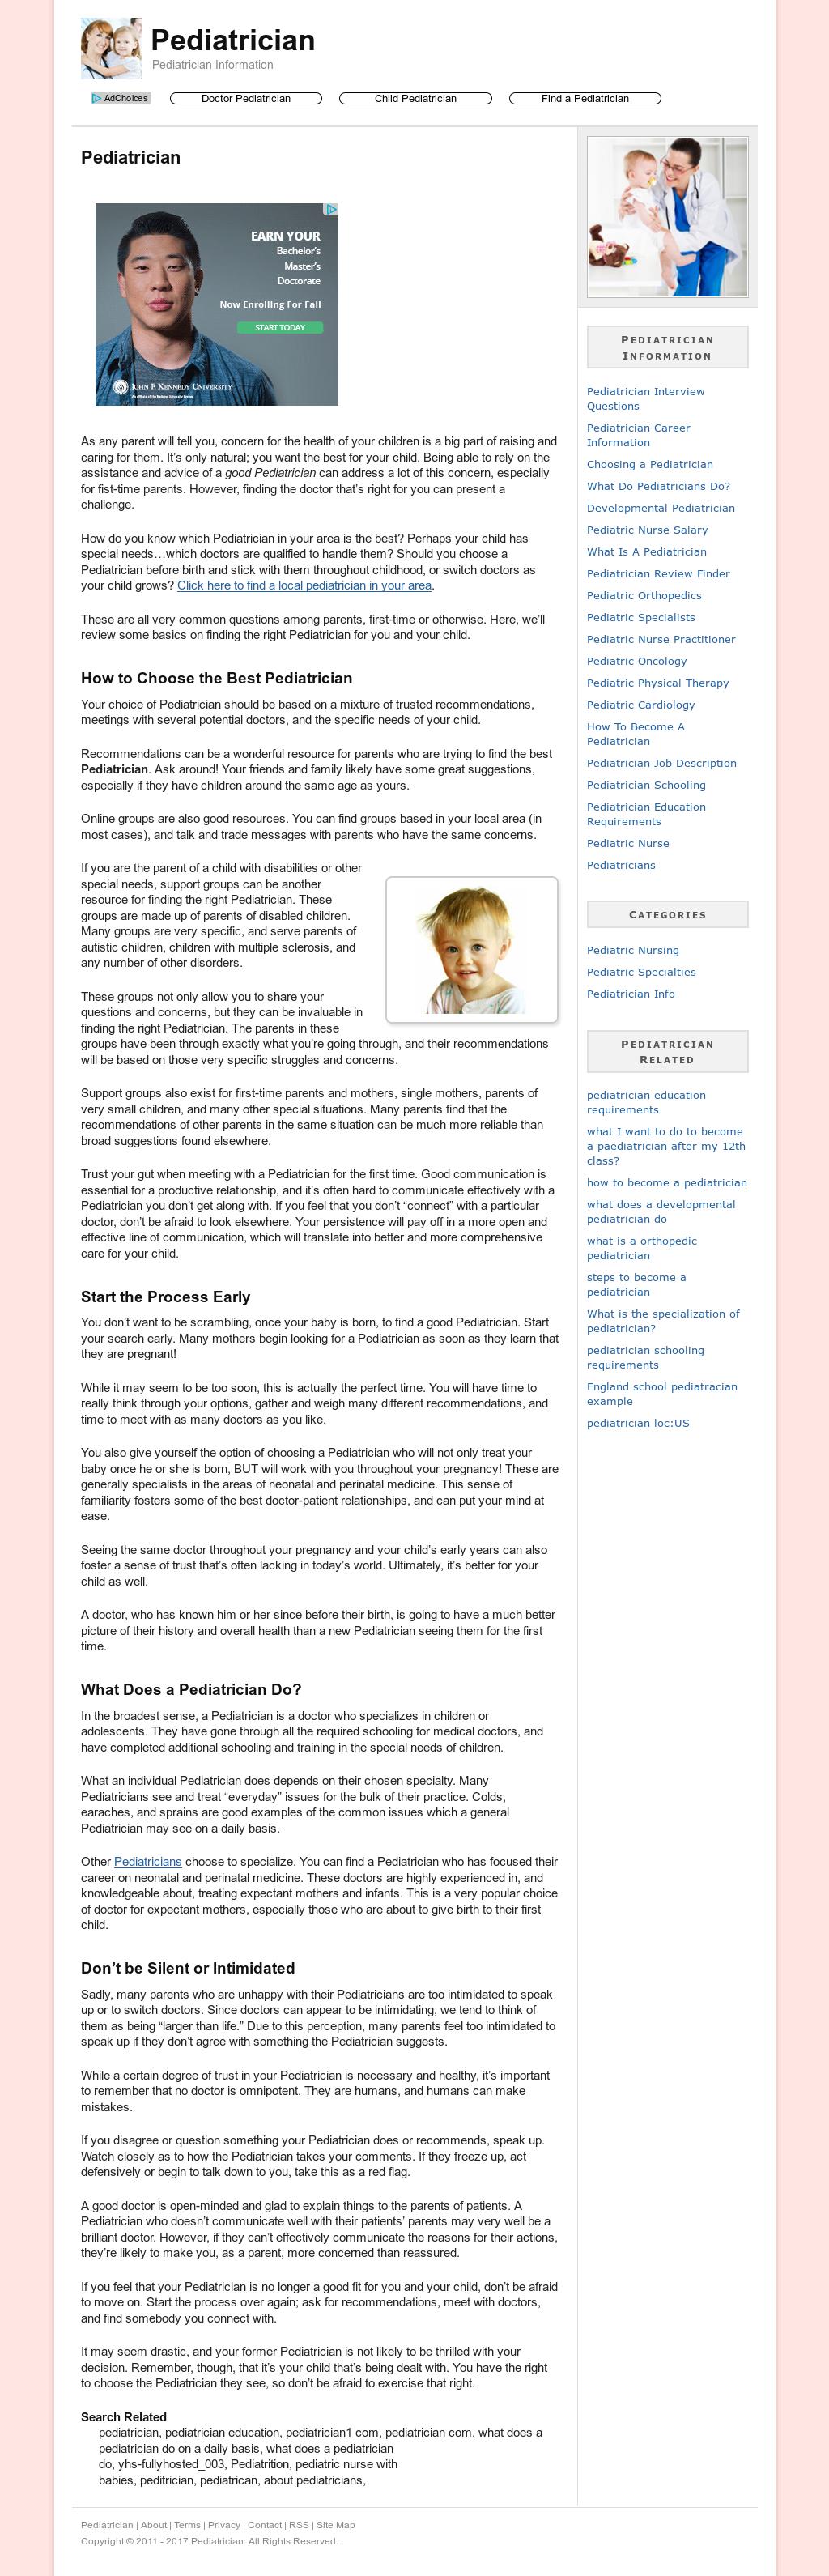 Pediatrician Competitors, Revenue and Employees - Owler Company Profile